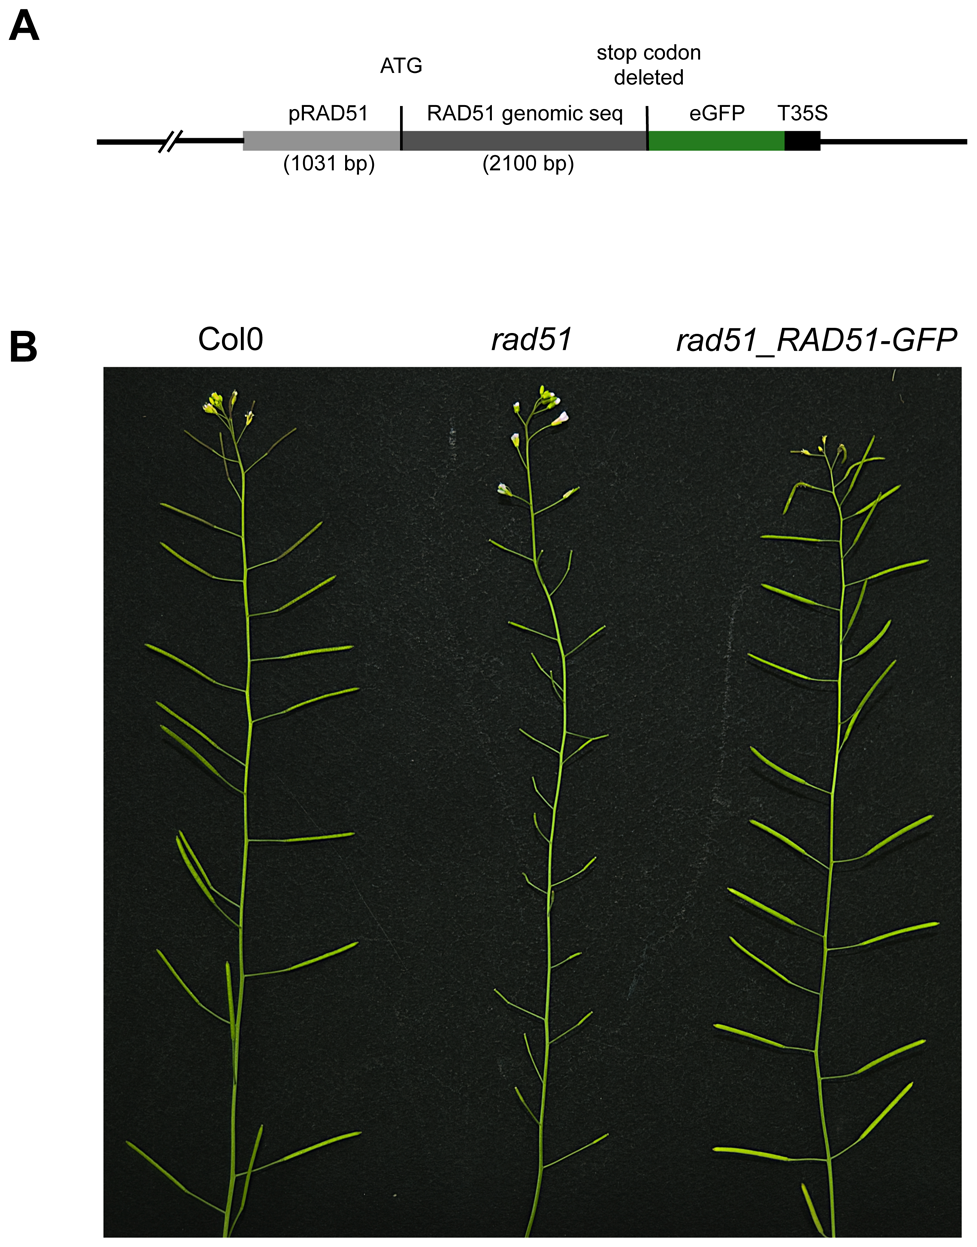 RAD51-GFP restores fertility of the Arabidopsis <i>rad51</i> mutant.